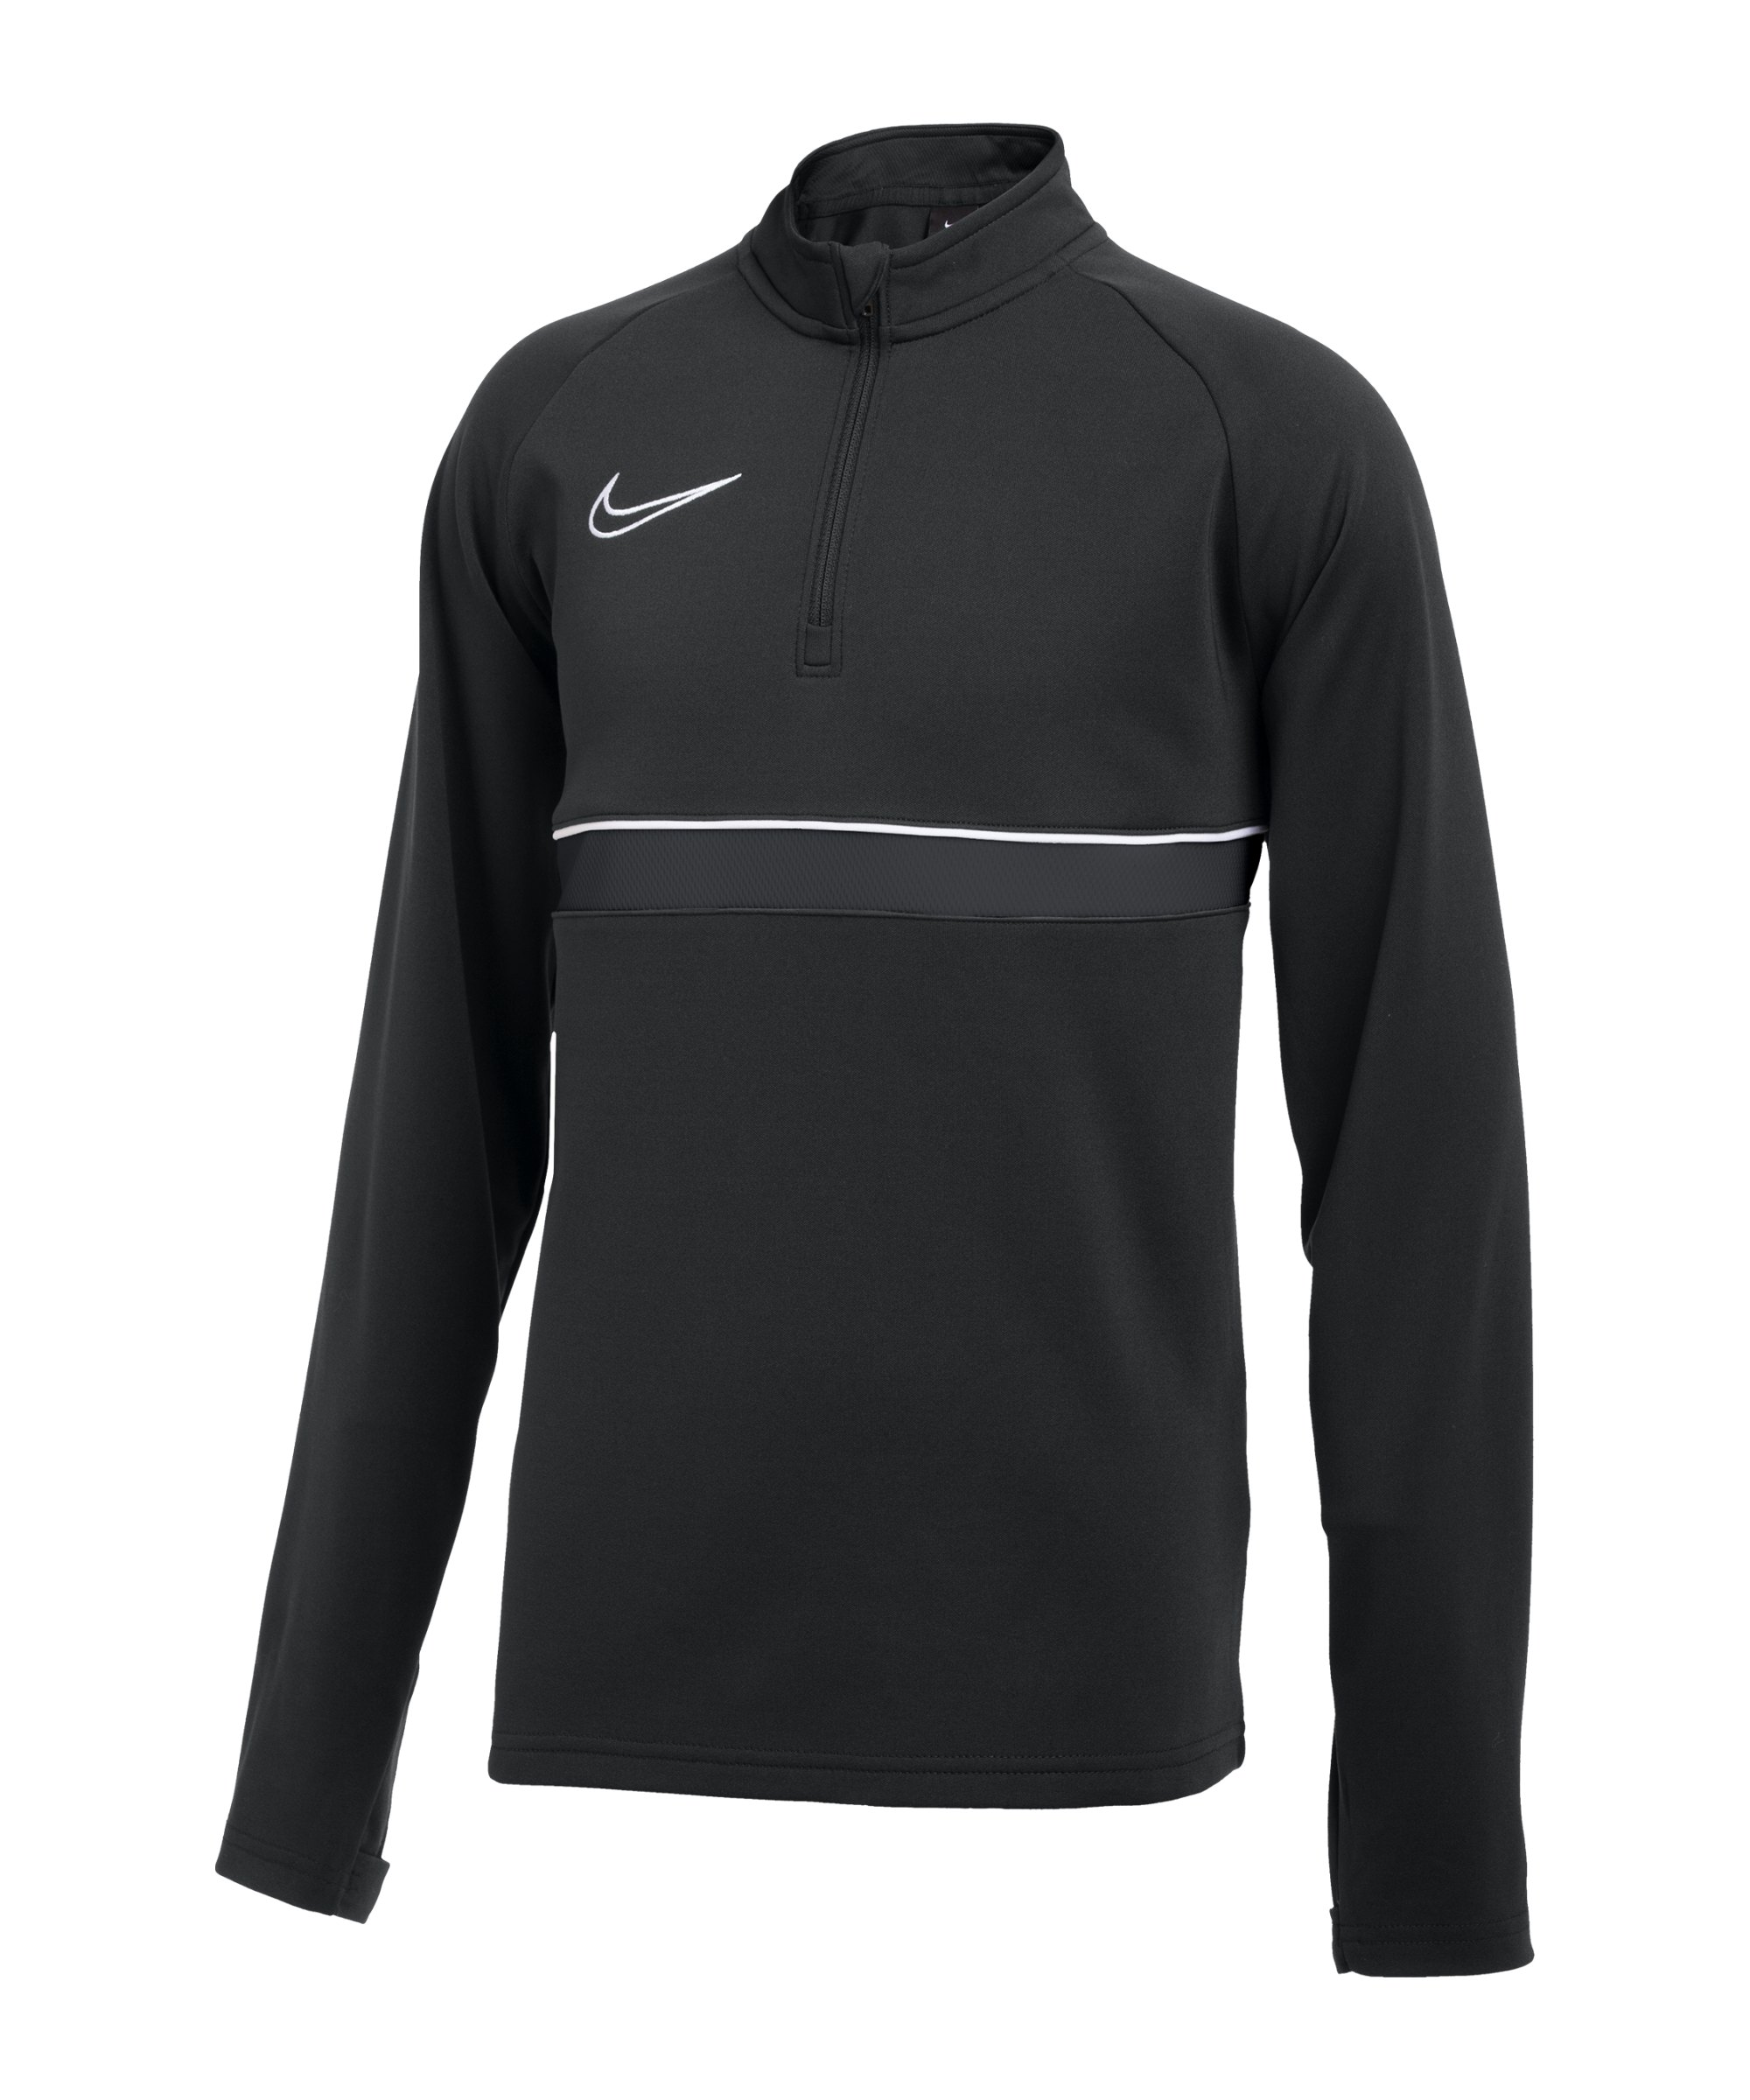 Nike Academy Drill Top Kids Schwarz Weiss F014 - schwarz